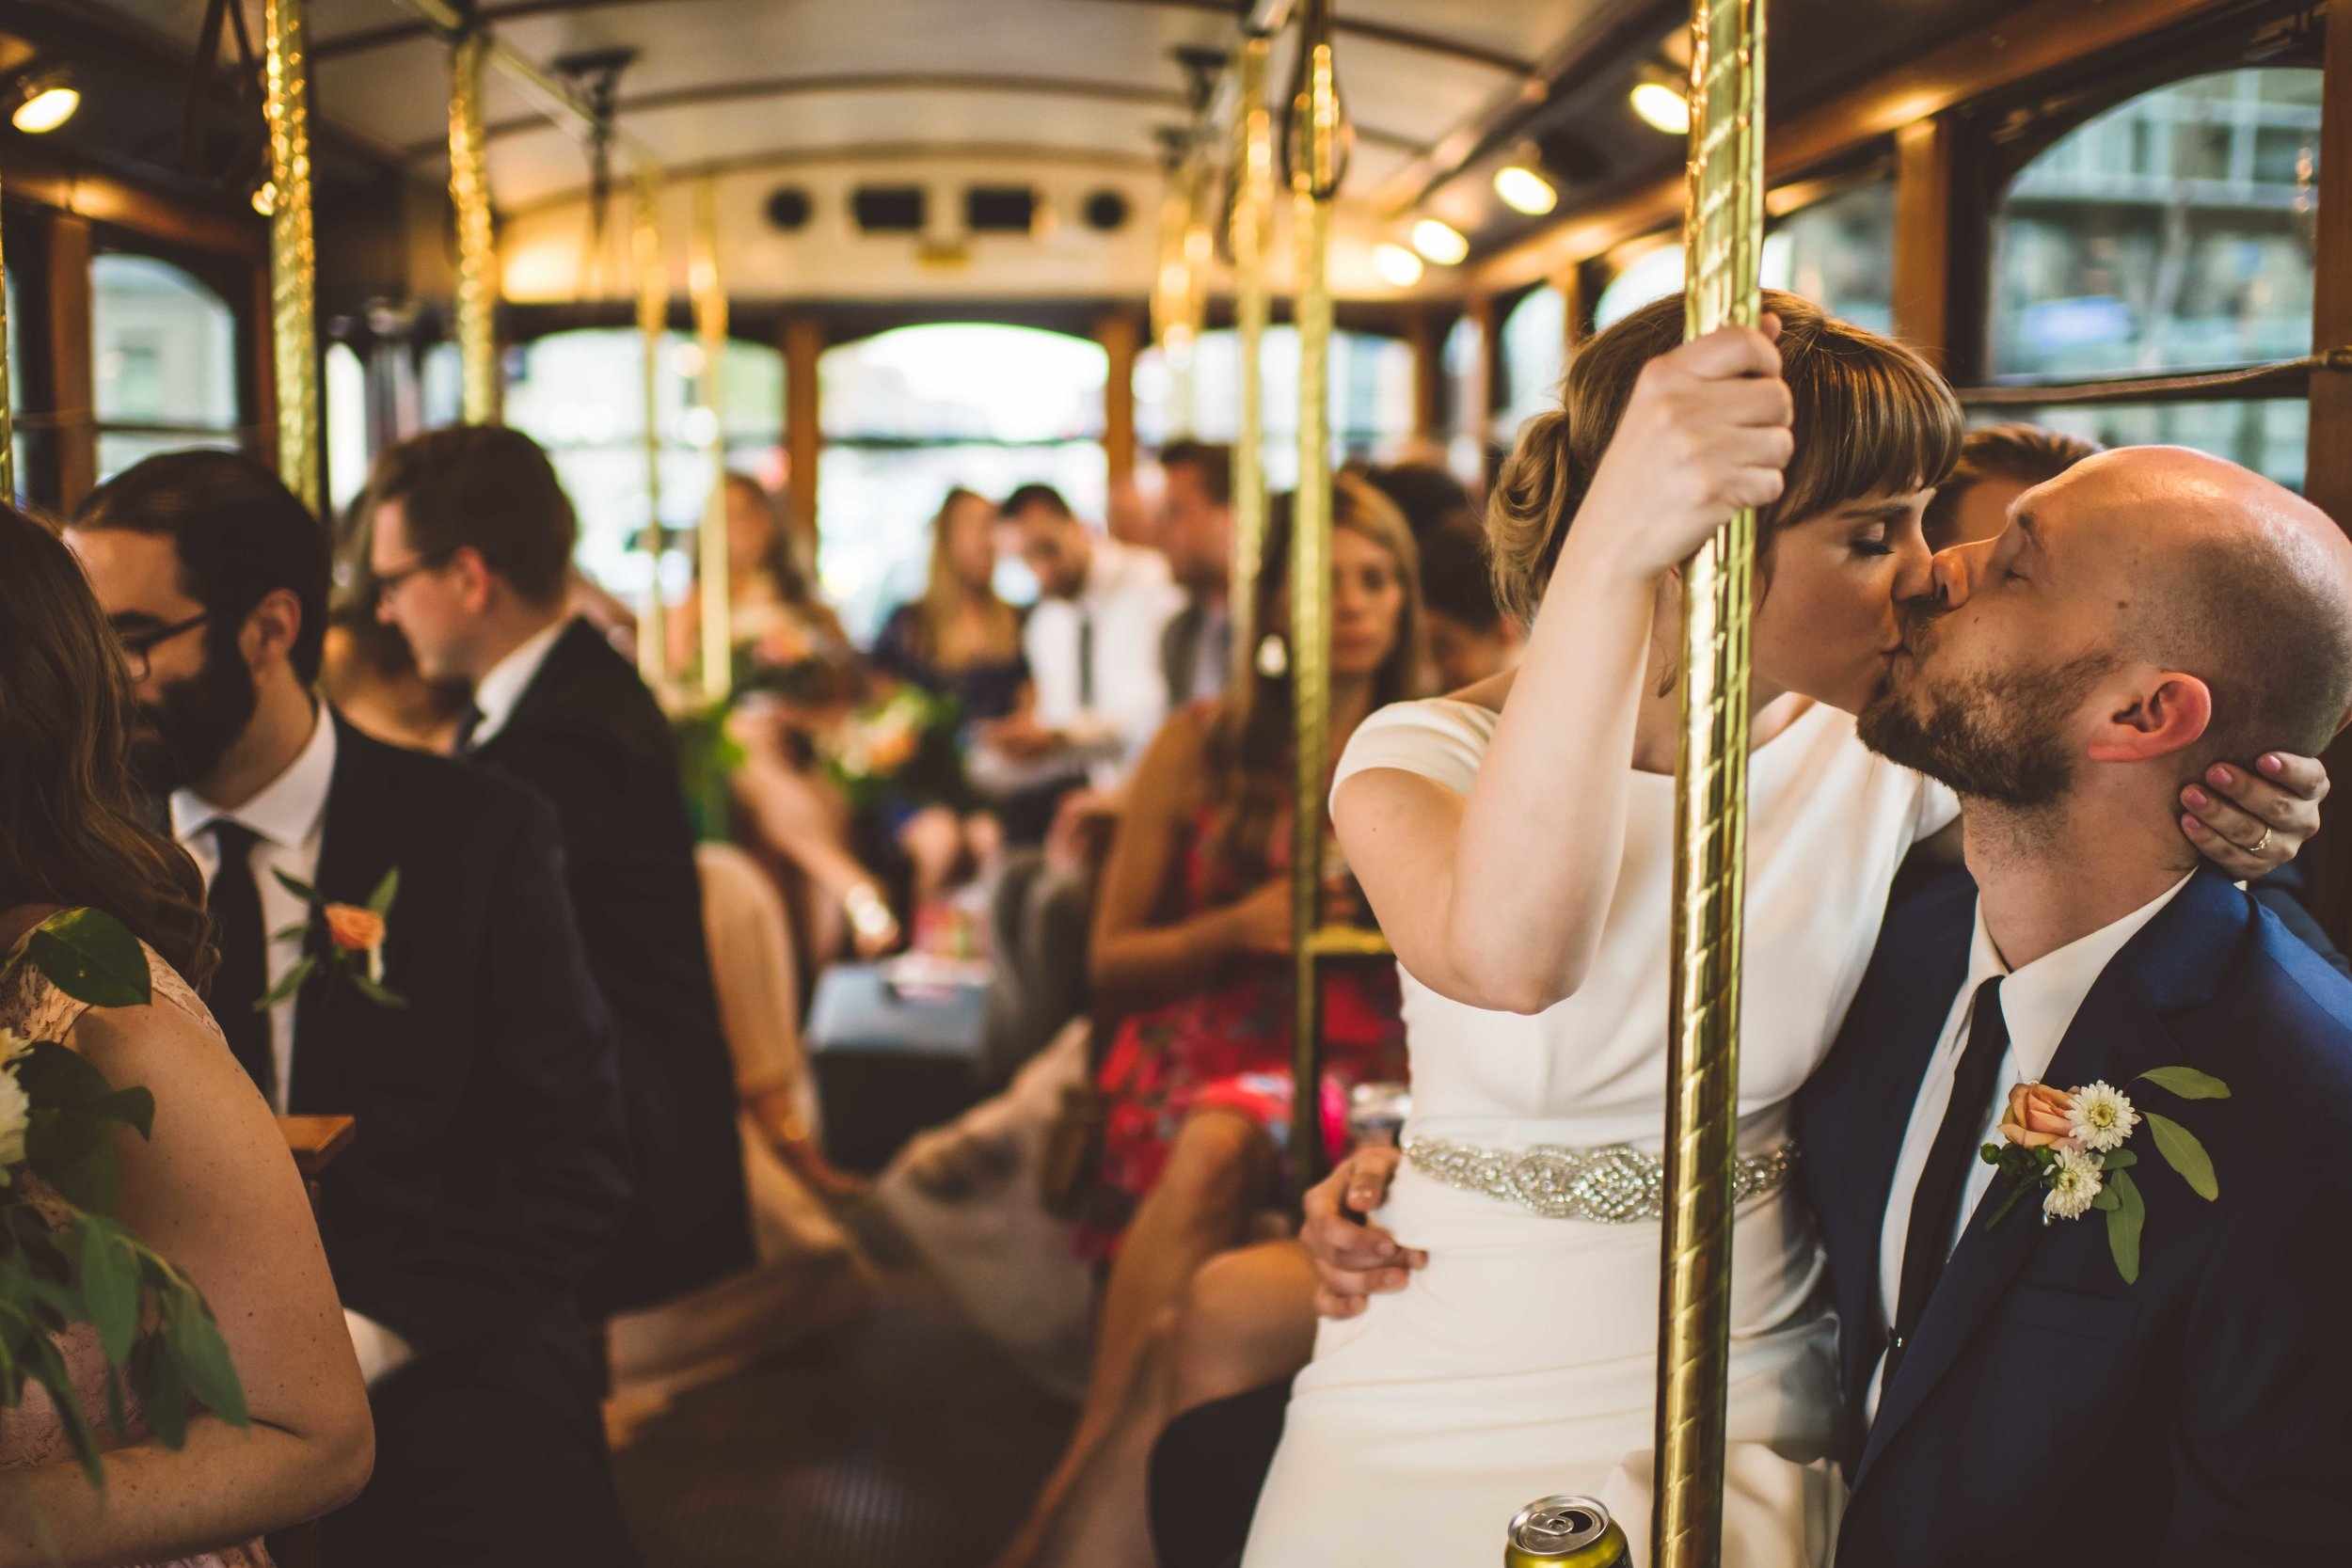 Secret kiss on the trolley